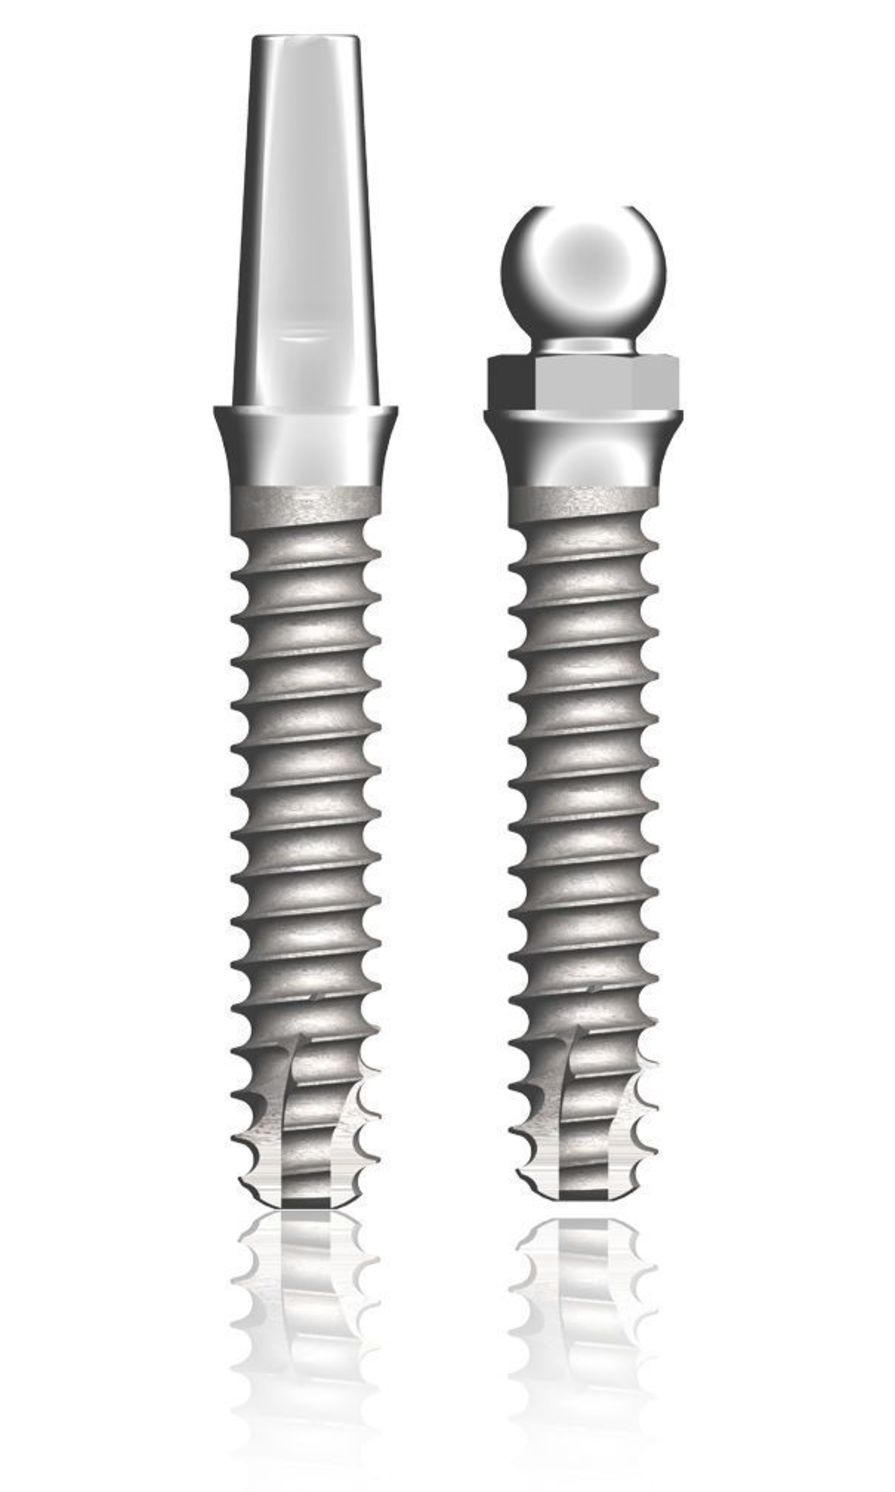 Cylindrical dental implant / titanium / self-tapping PERIOSAVE Slim 2.5 TBR GROUP SUDIMPLANT SA